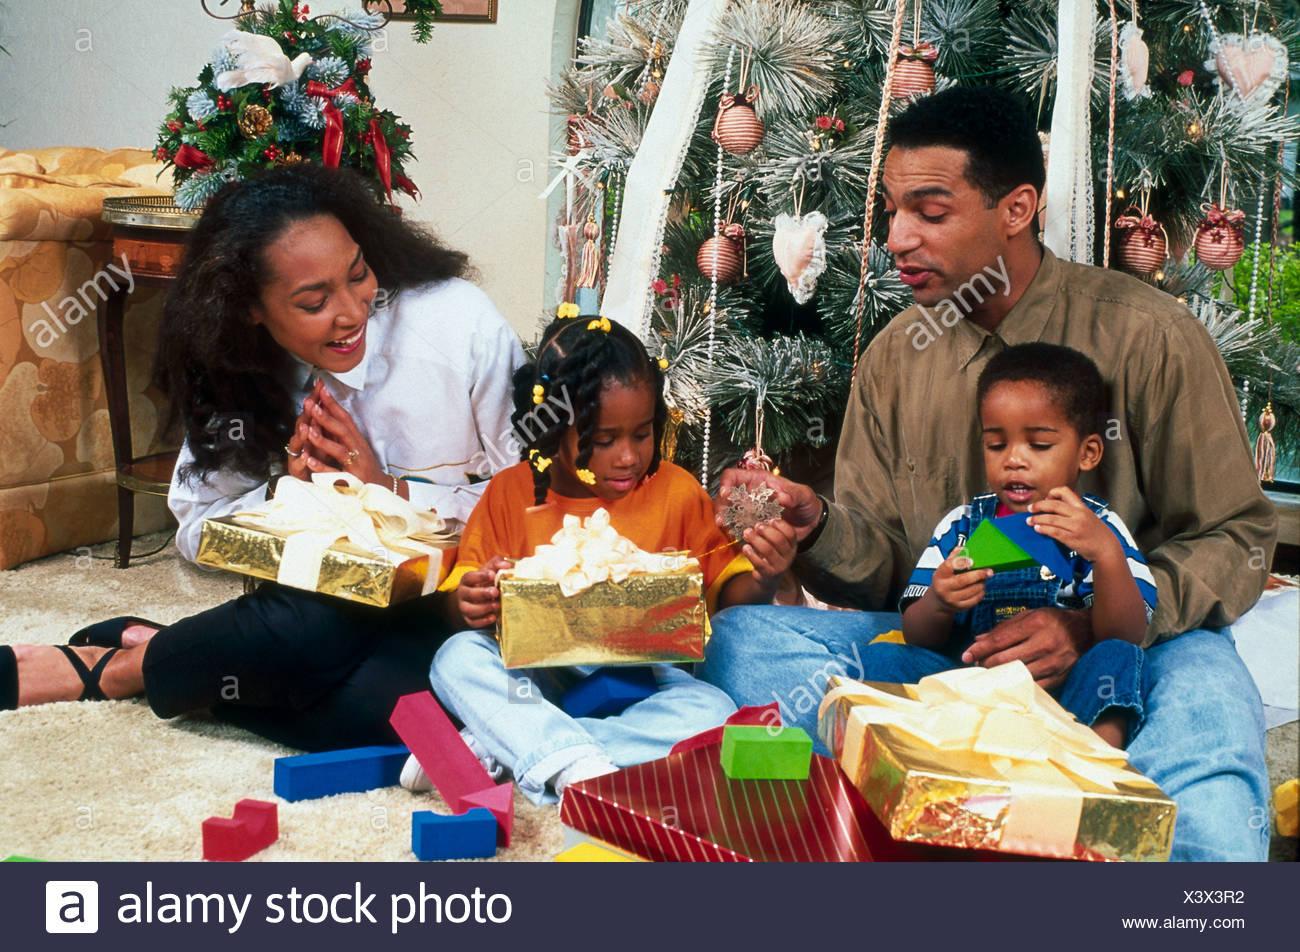 Family unwrapping christmas gifts USA Stock Photo: 277783606 - Alamy